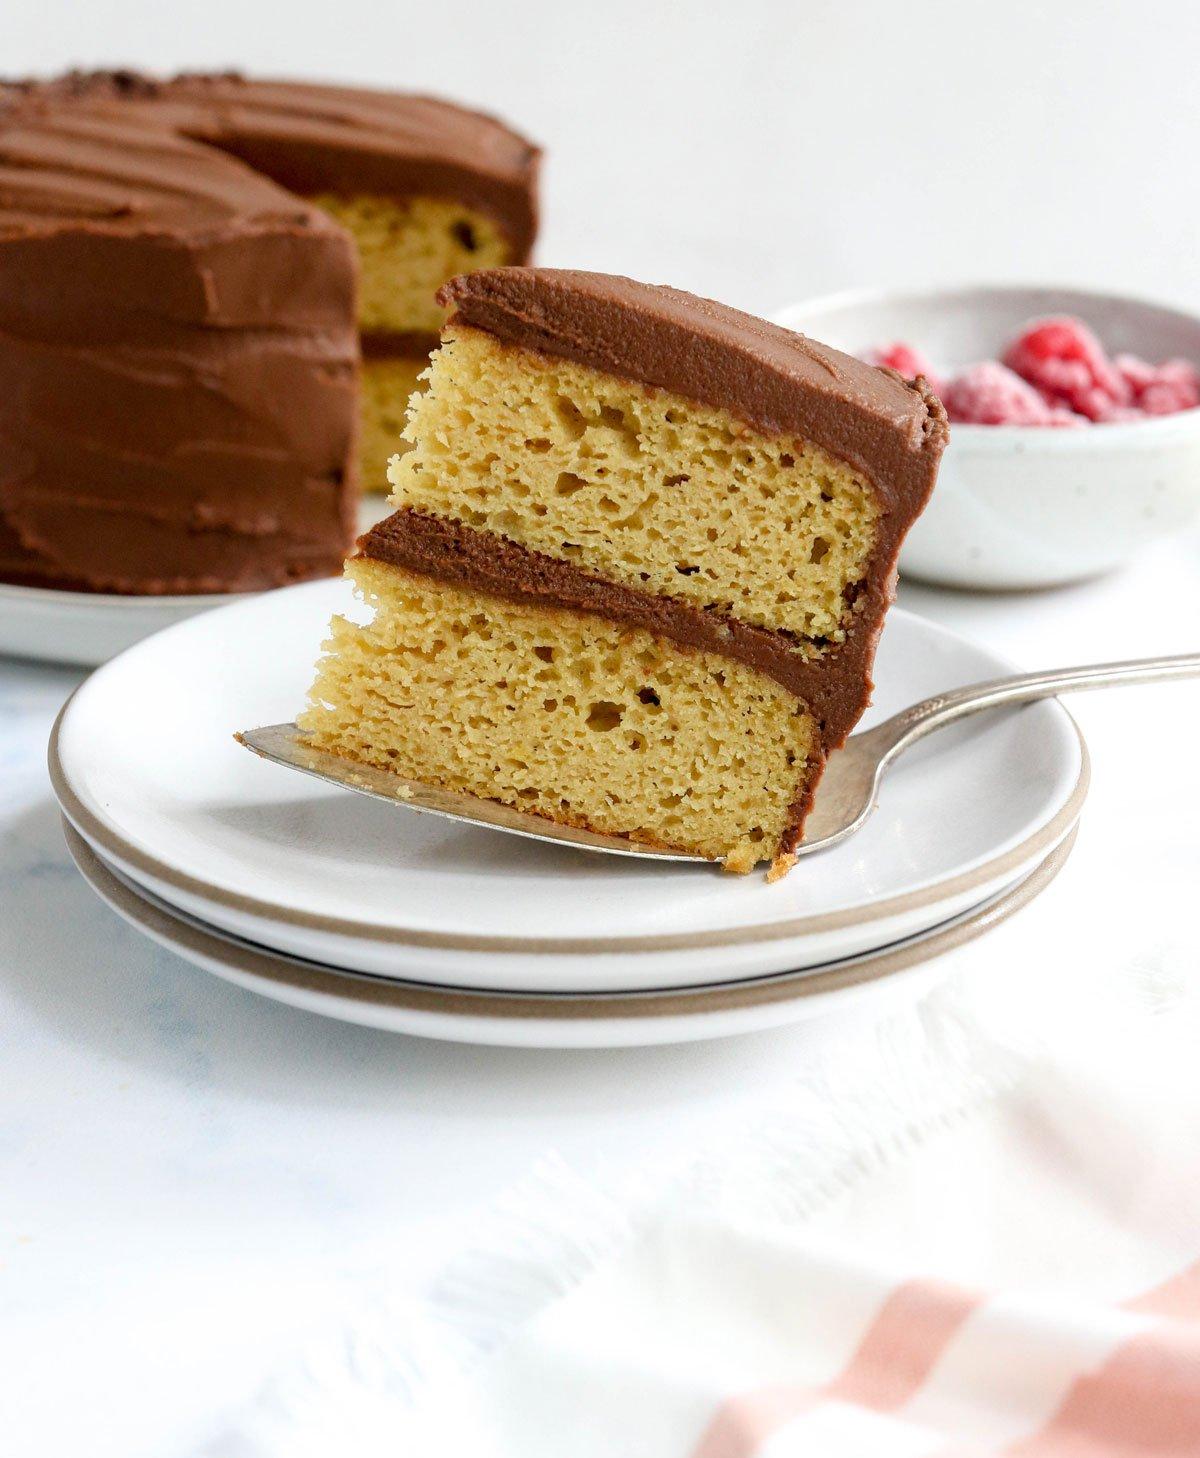 sliced of almond flour cake balanced on a cake server